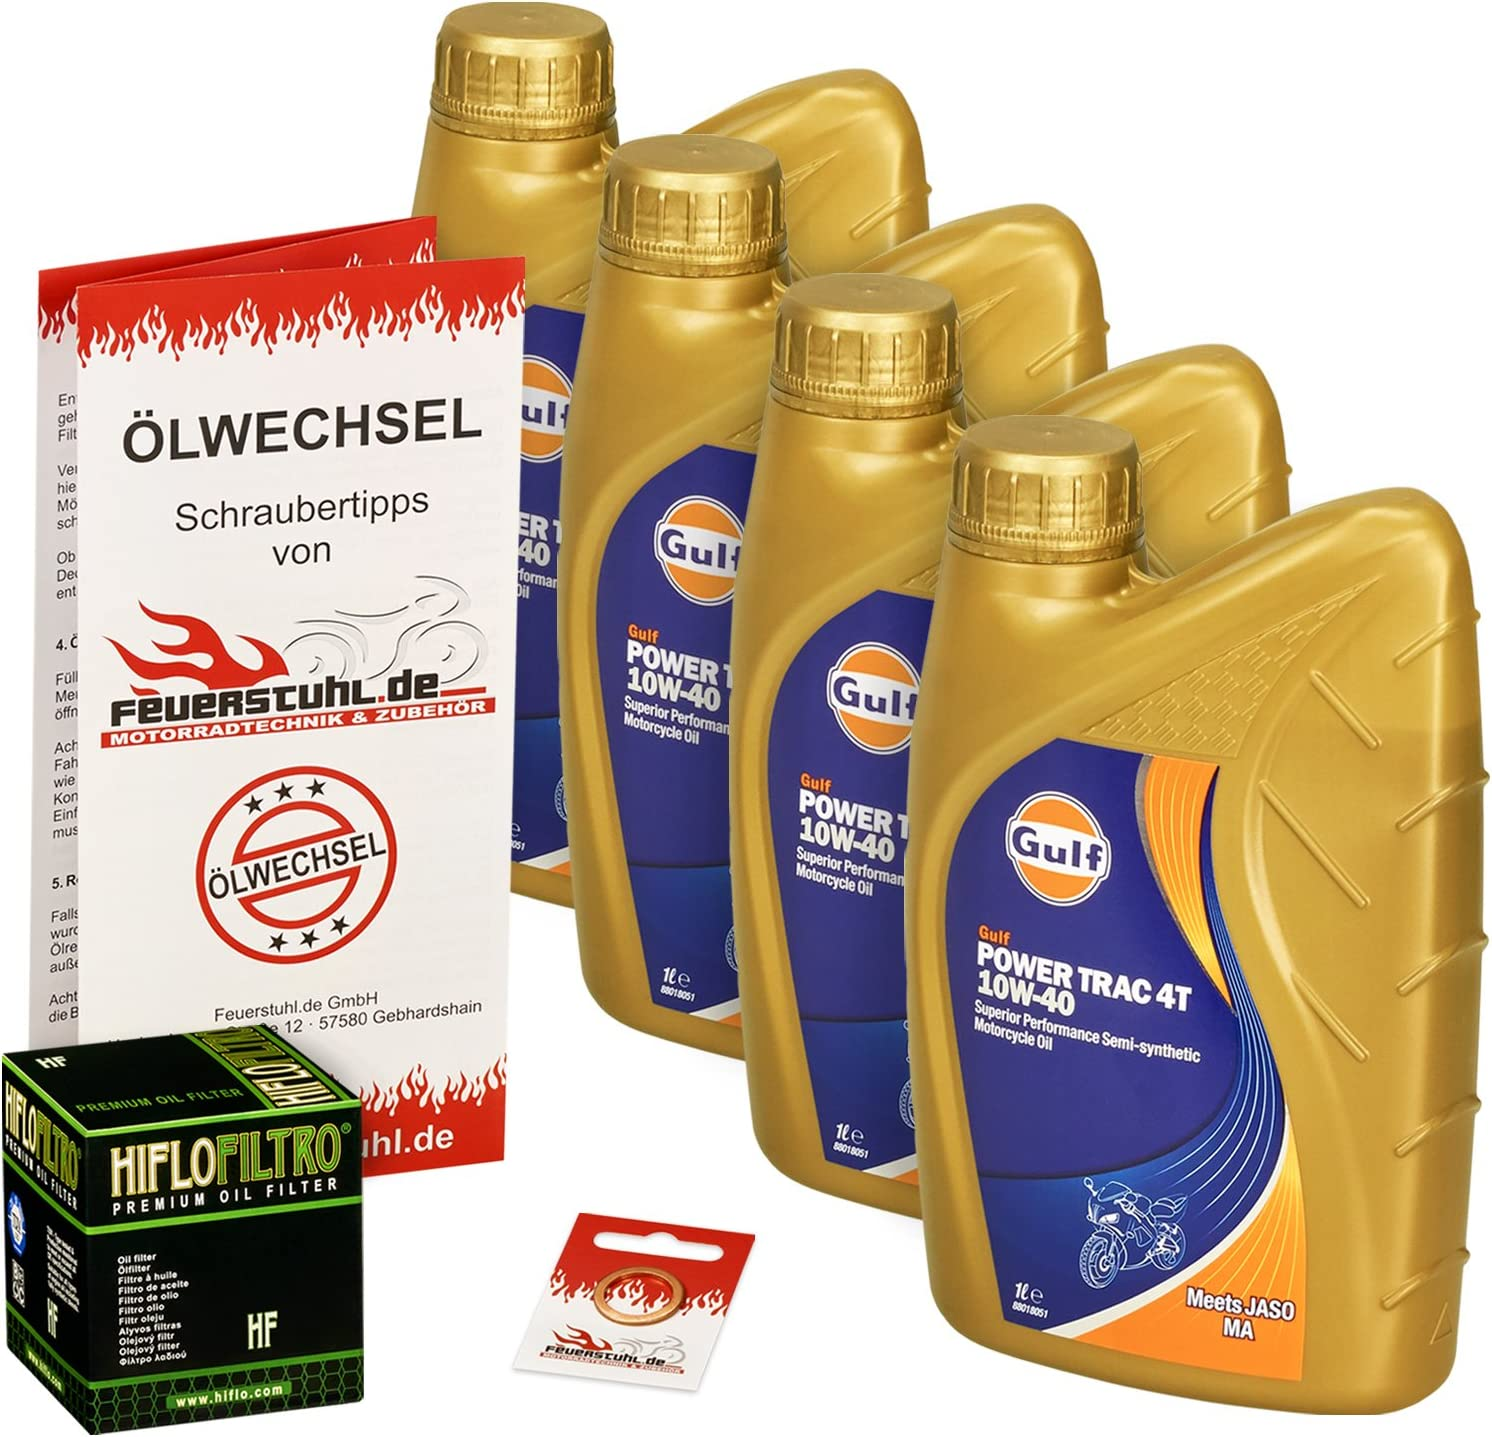 Gulf 10w 40 Öl Hiflo Ölfilter Für Honda Cbr 1000 F 87 0 Sc21 Sc24 Ölwechselset Inkl Motoröl Filter Dichtring Auto